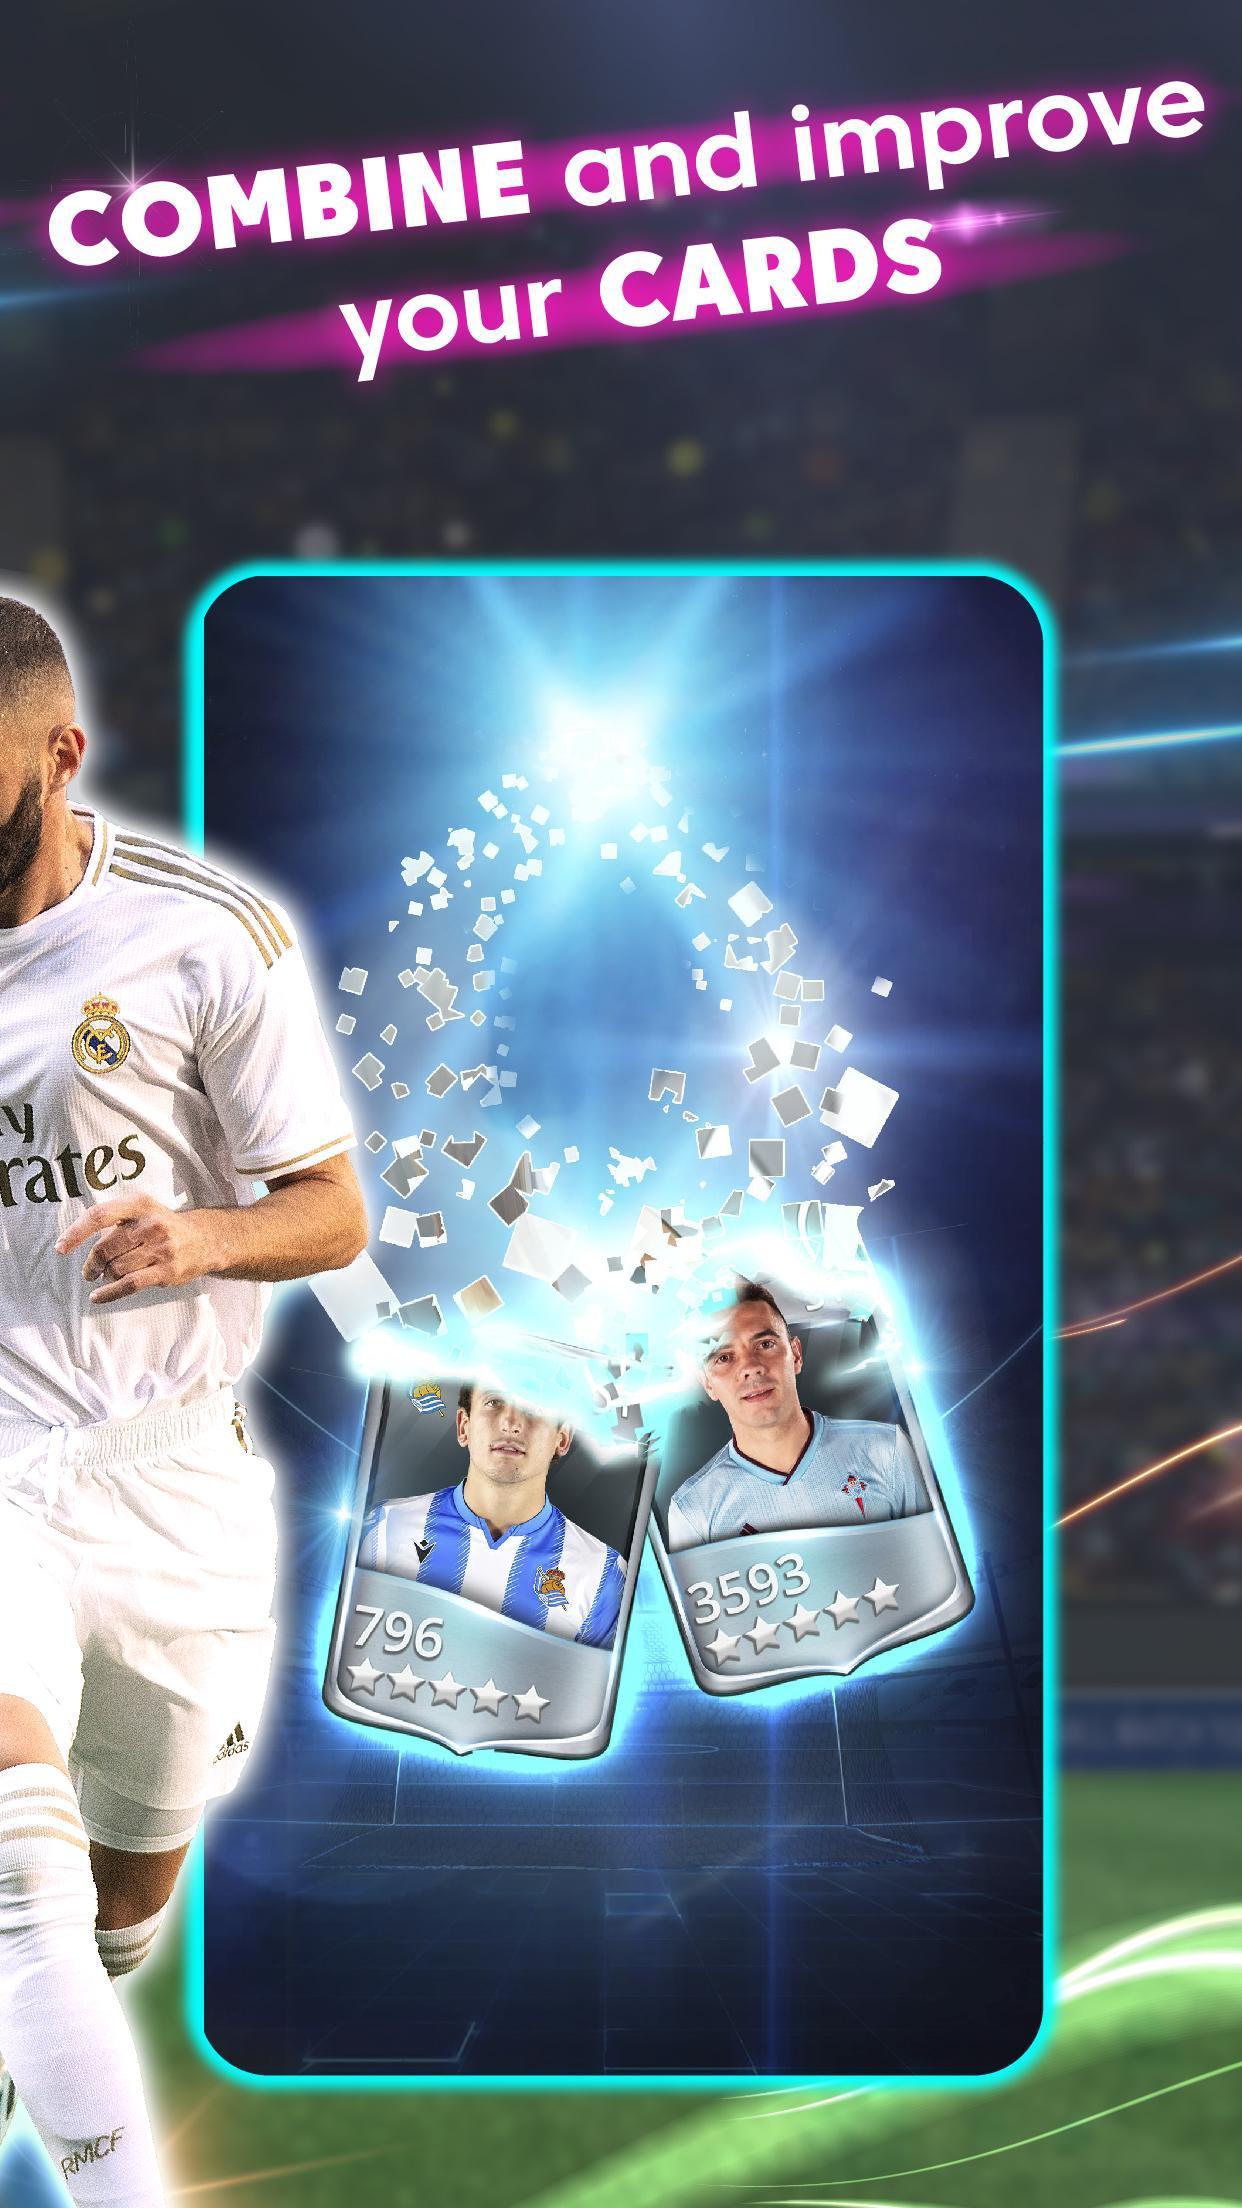 LaLiga Top Cards 2020 - Soccer Card Battle Game 4.1.4 Screenshot 5